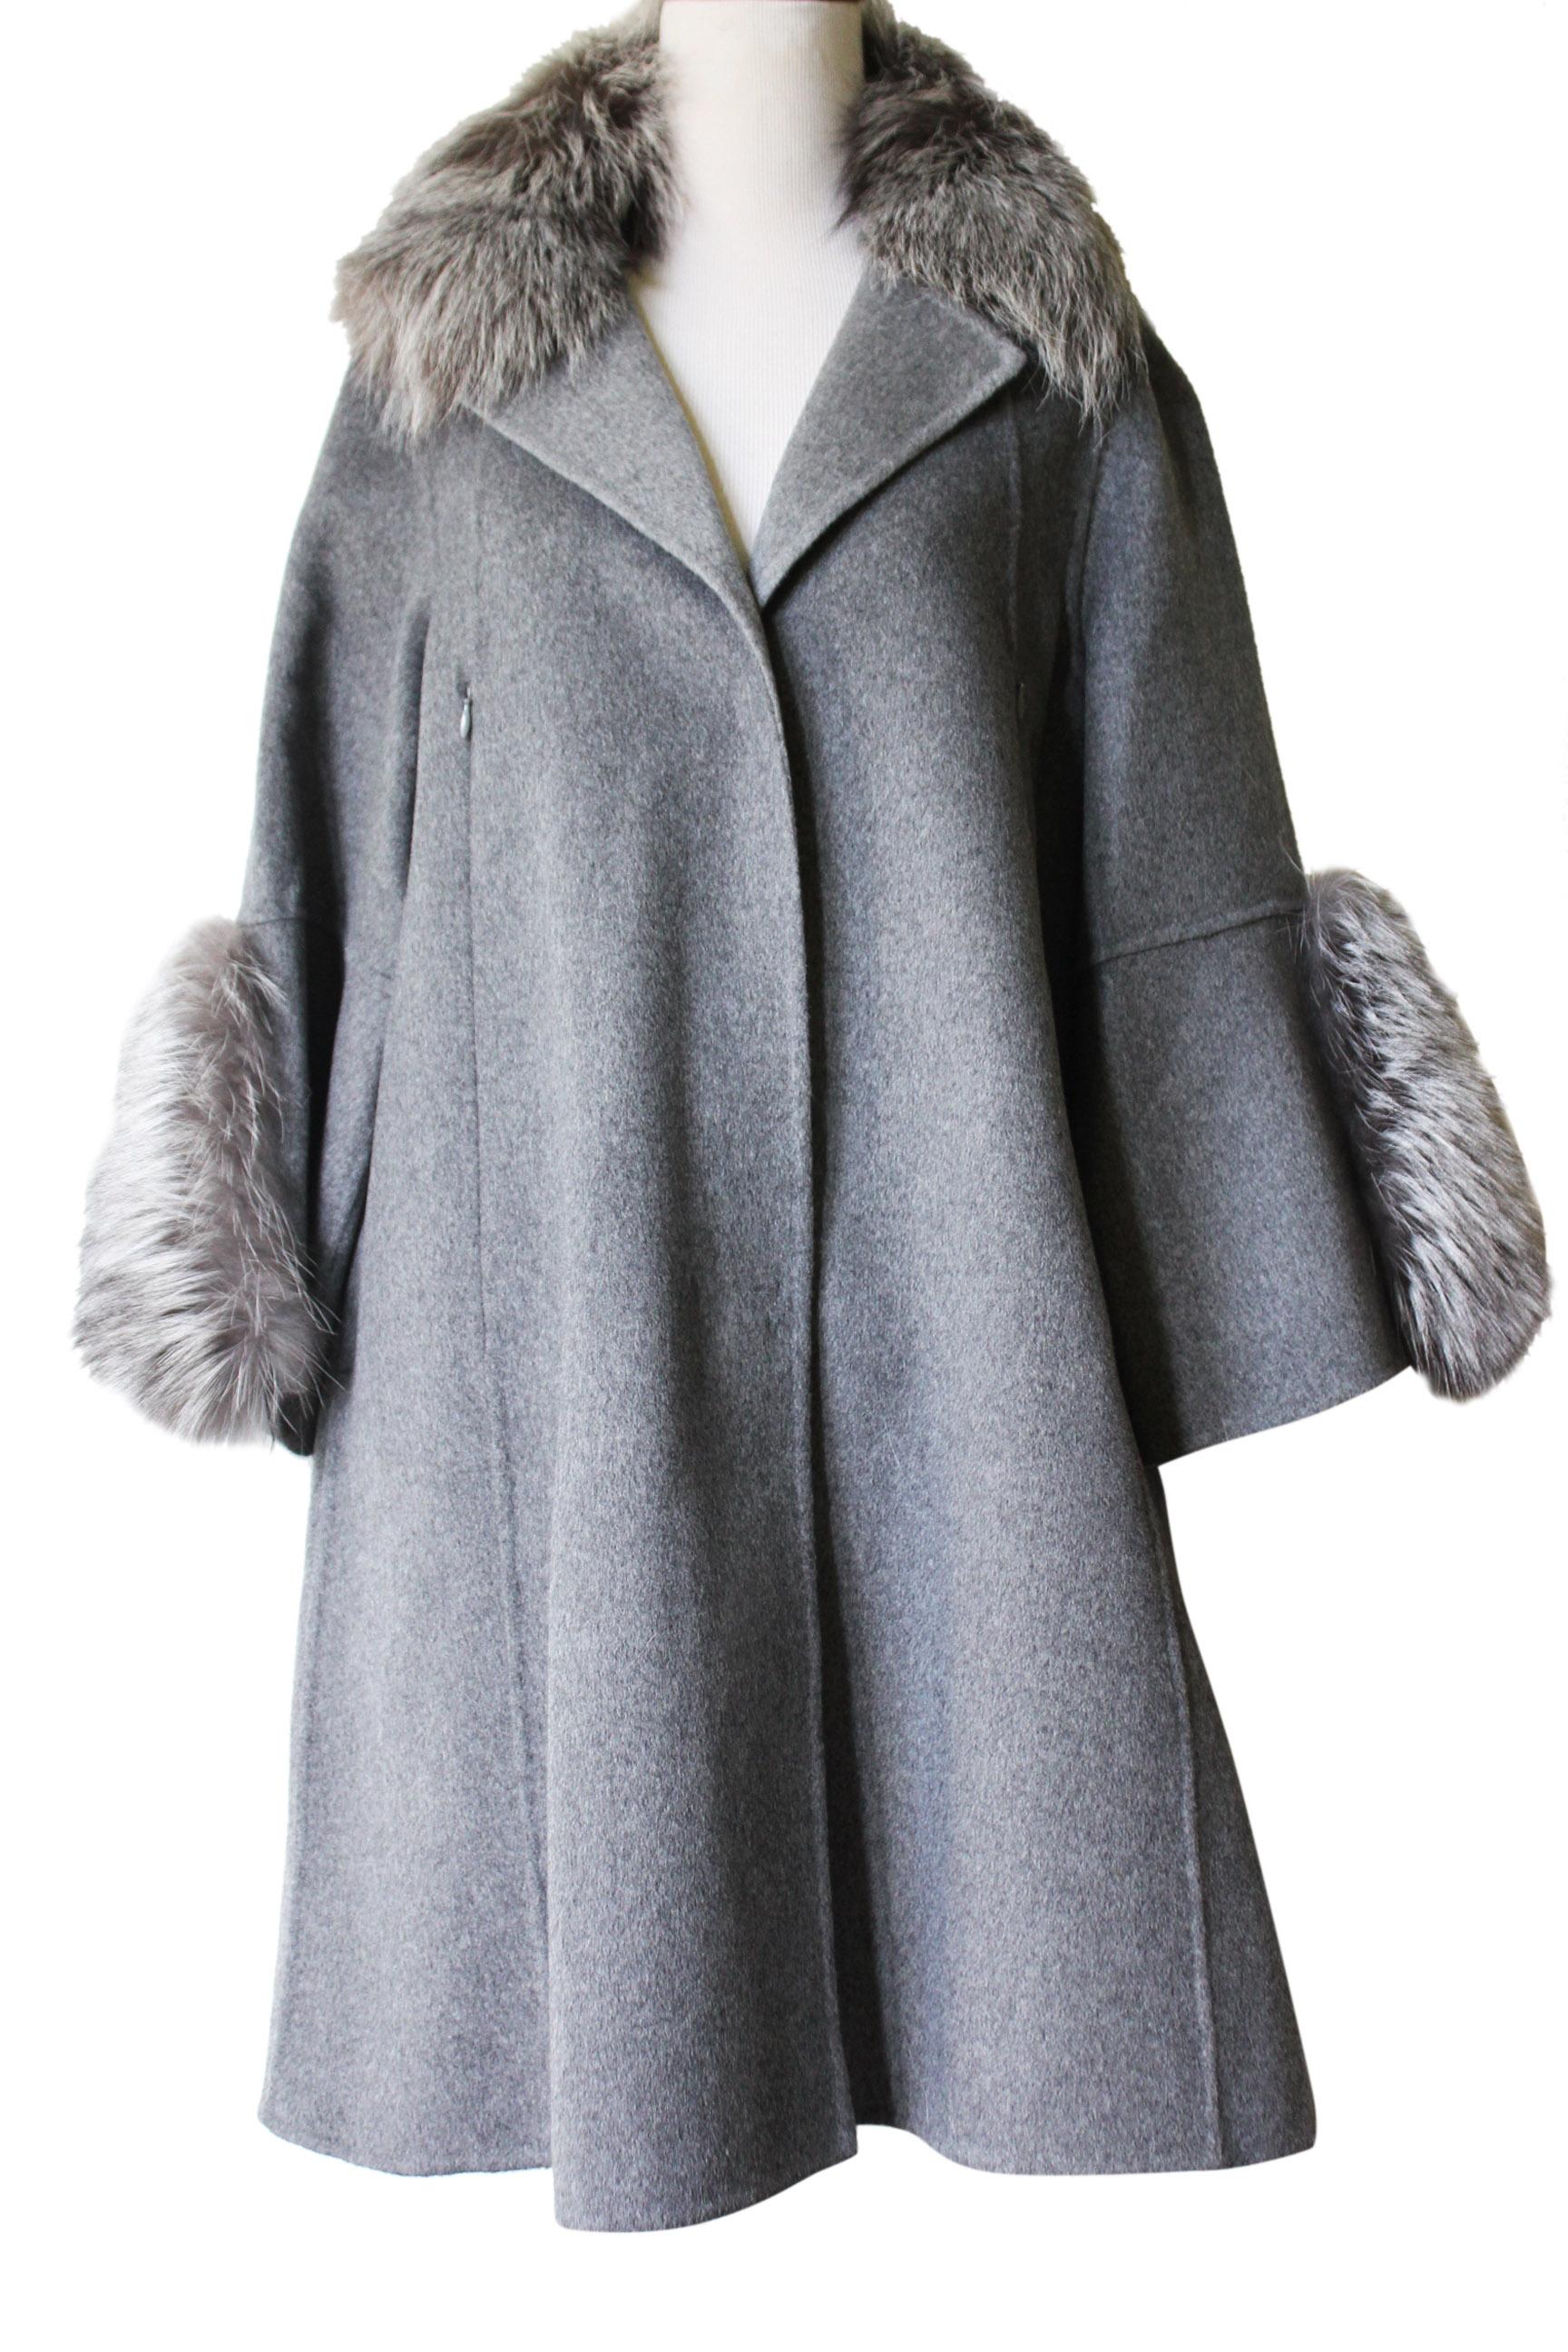 Rish NY Collection 2019-2020Fall-Winter リッシュ・ニューヨーク2019-2020秋冬